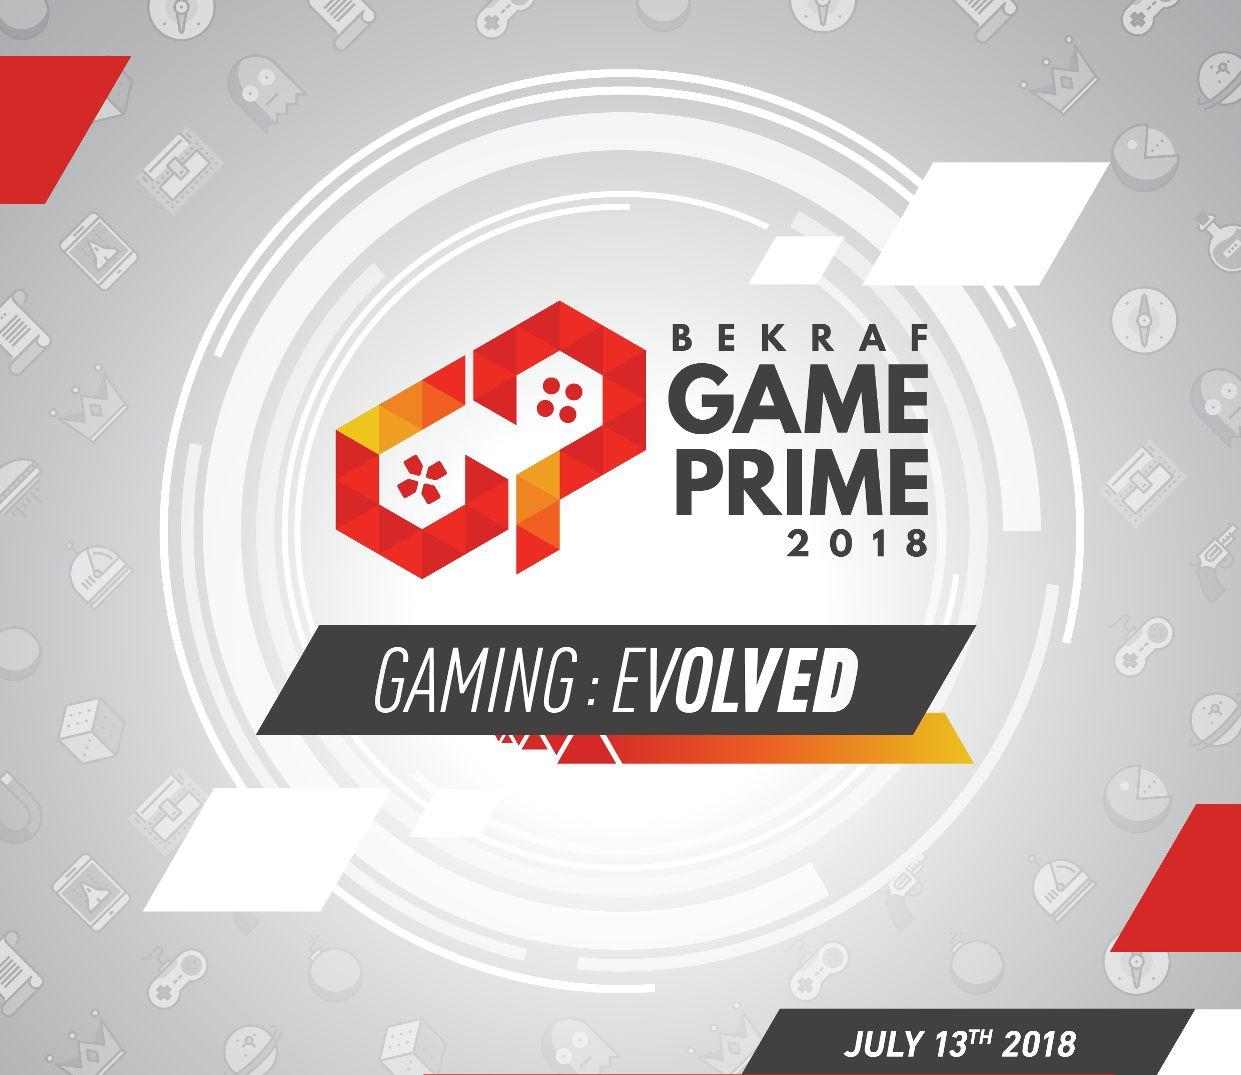 Bekraf Game Prime 2018 (Business Day)